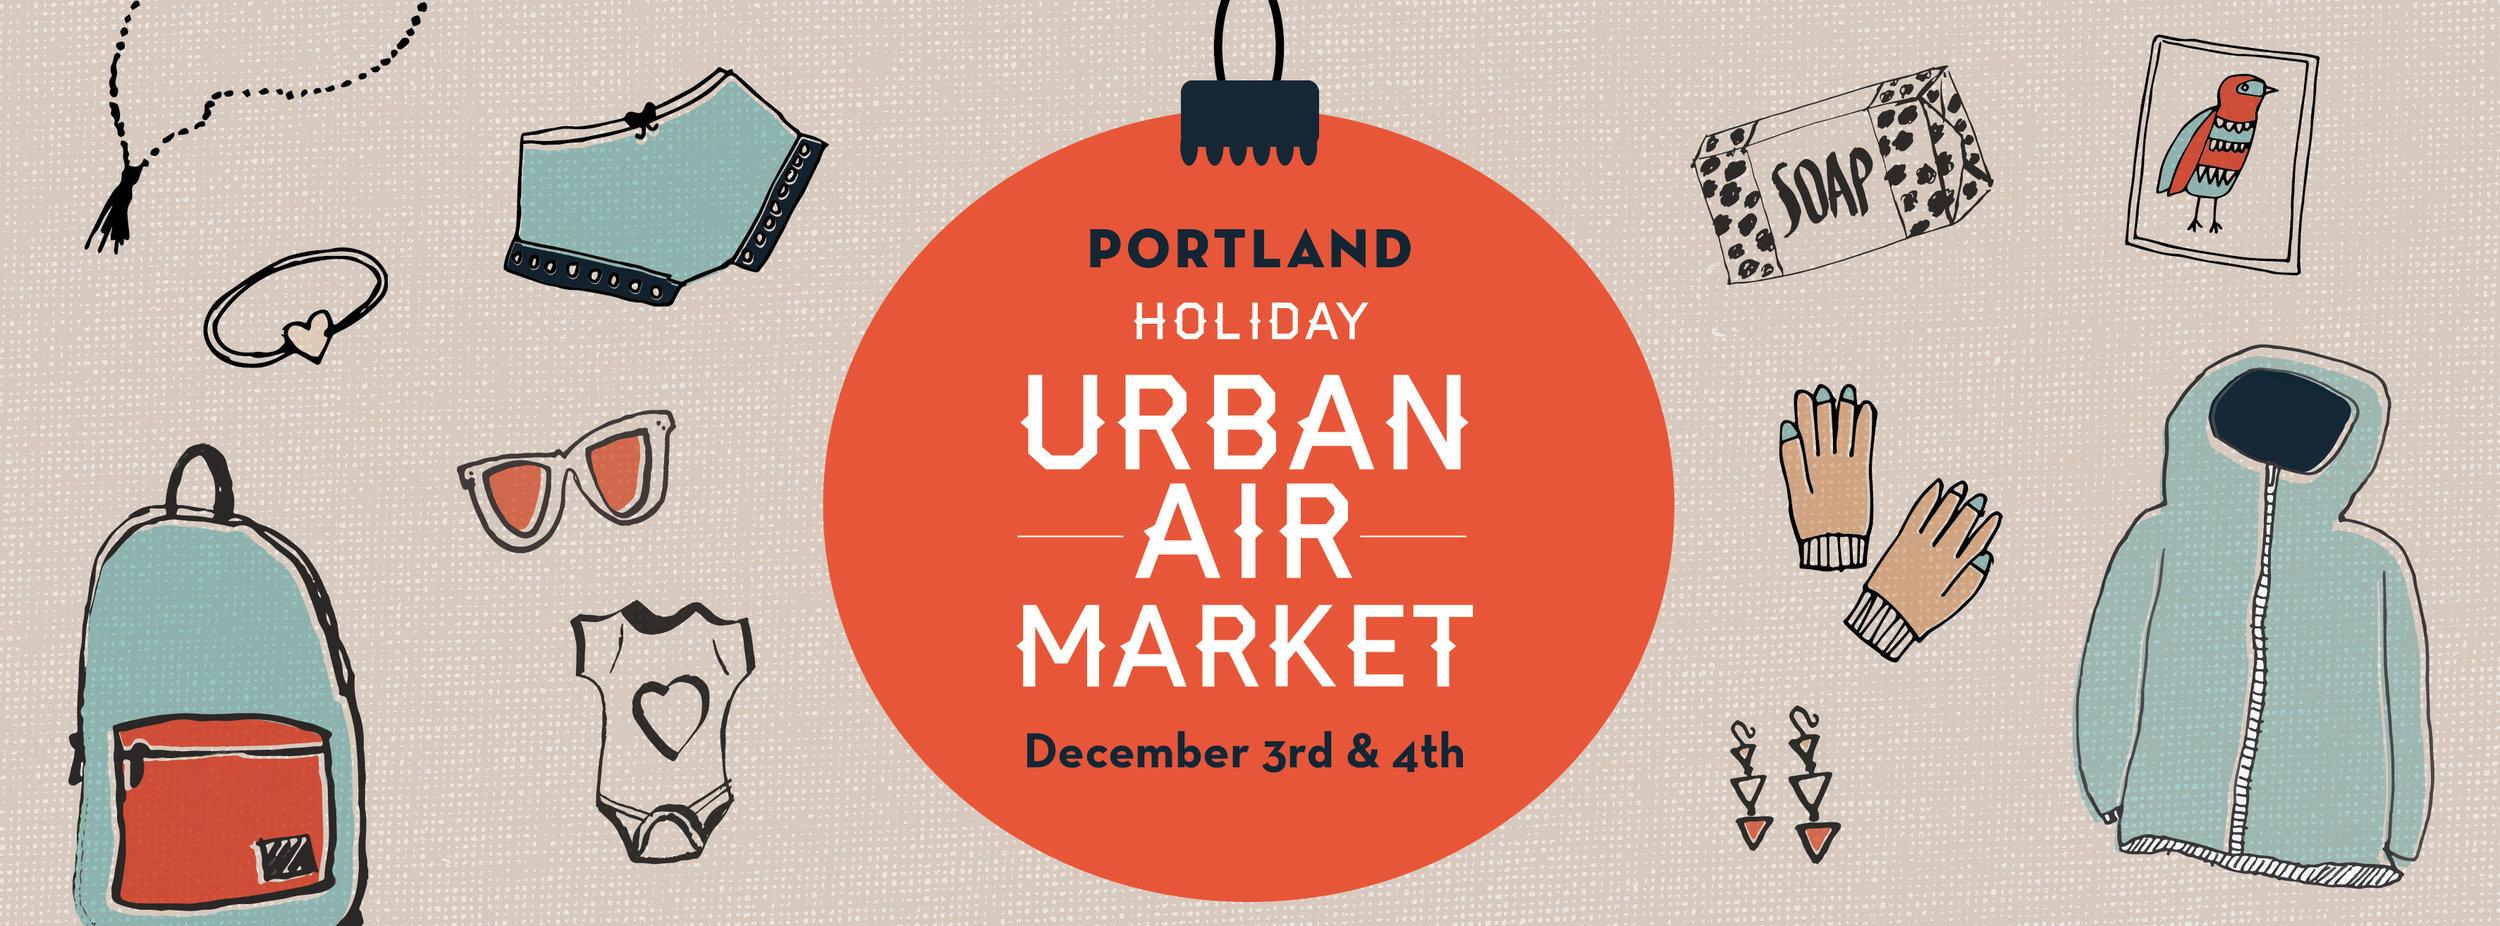 urban air market straight razor booth banner